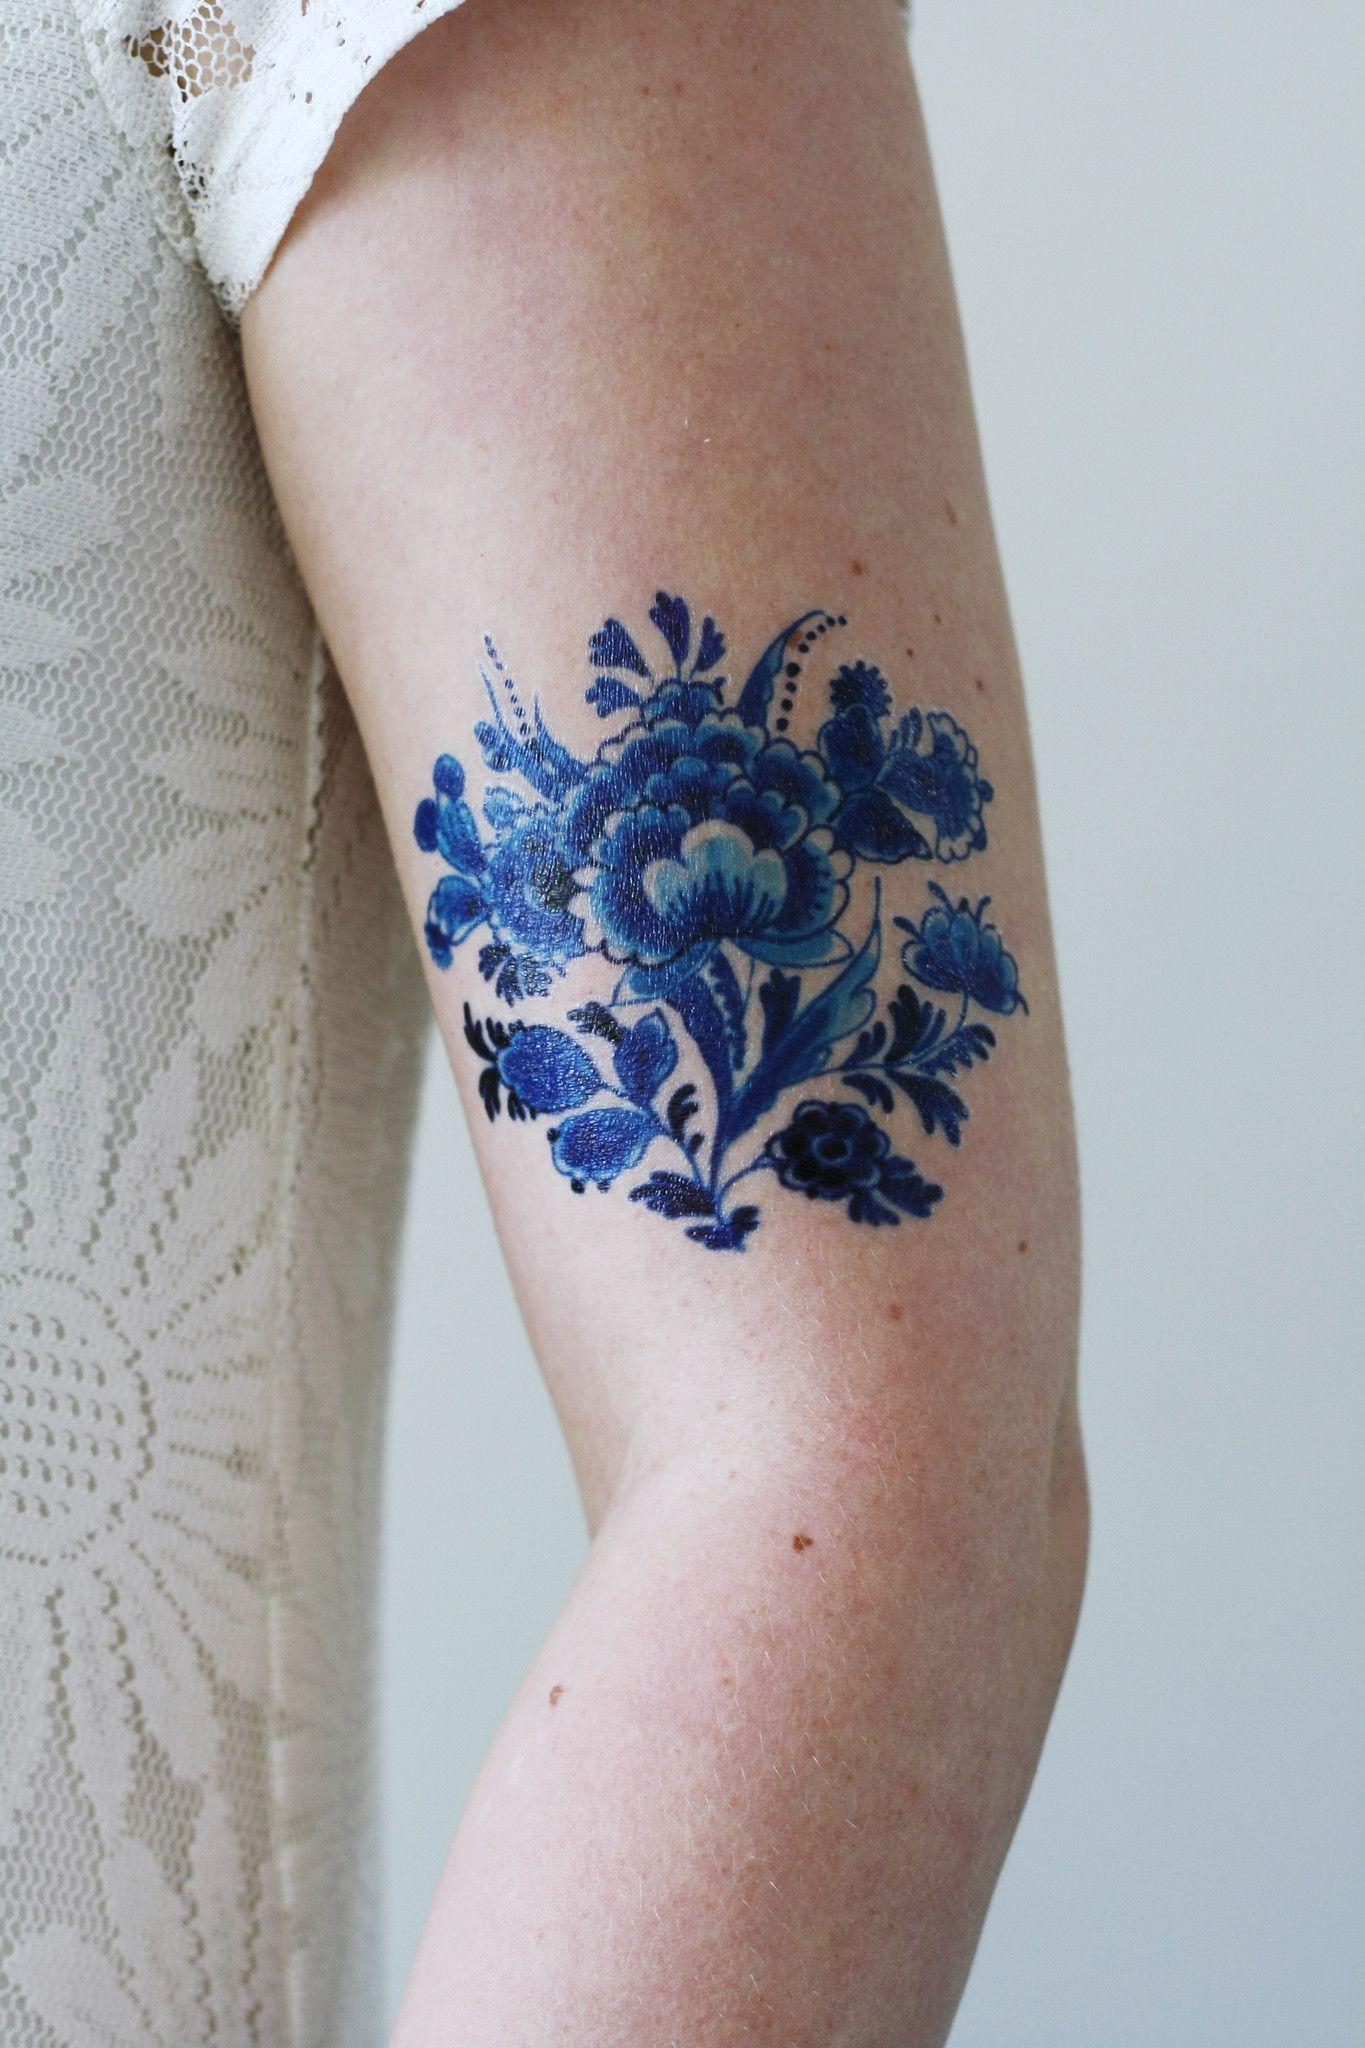 Delft Blue Tattoo Delft Blue Blue Tattoo Blue Ink